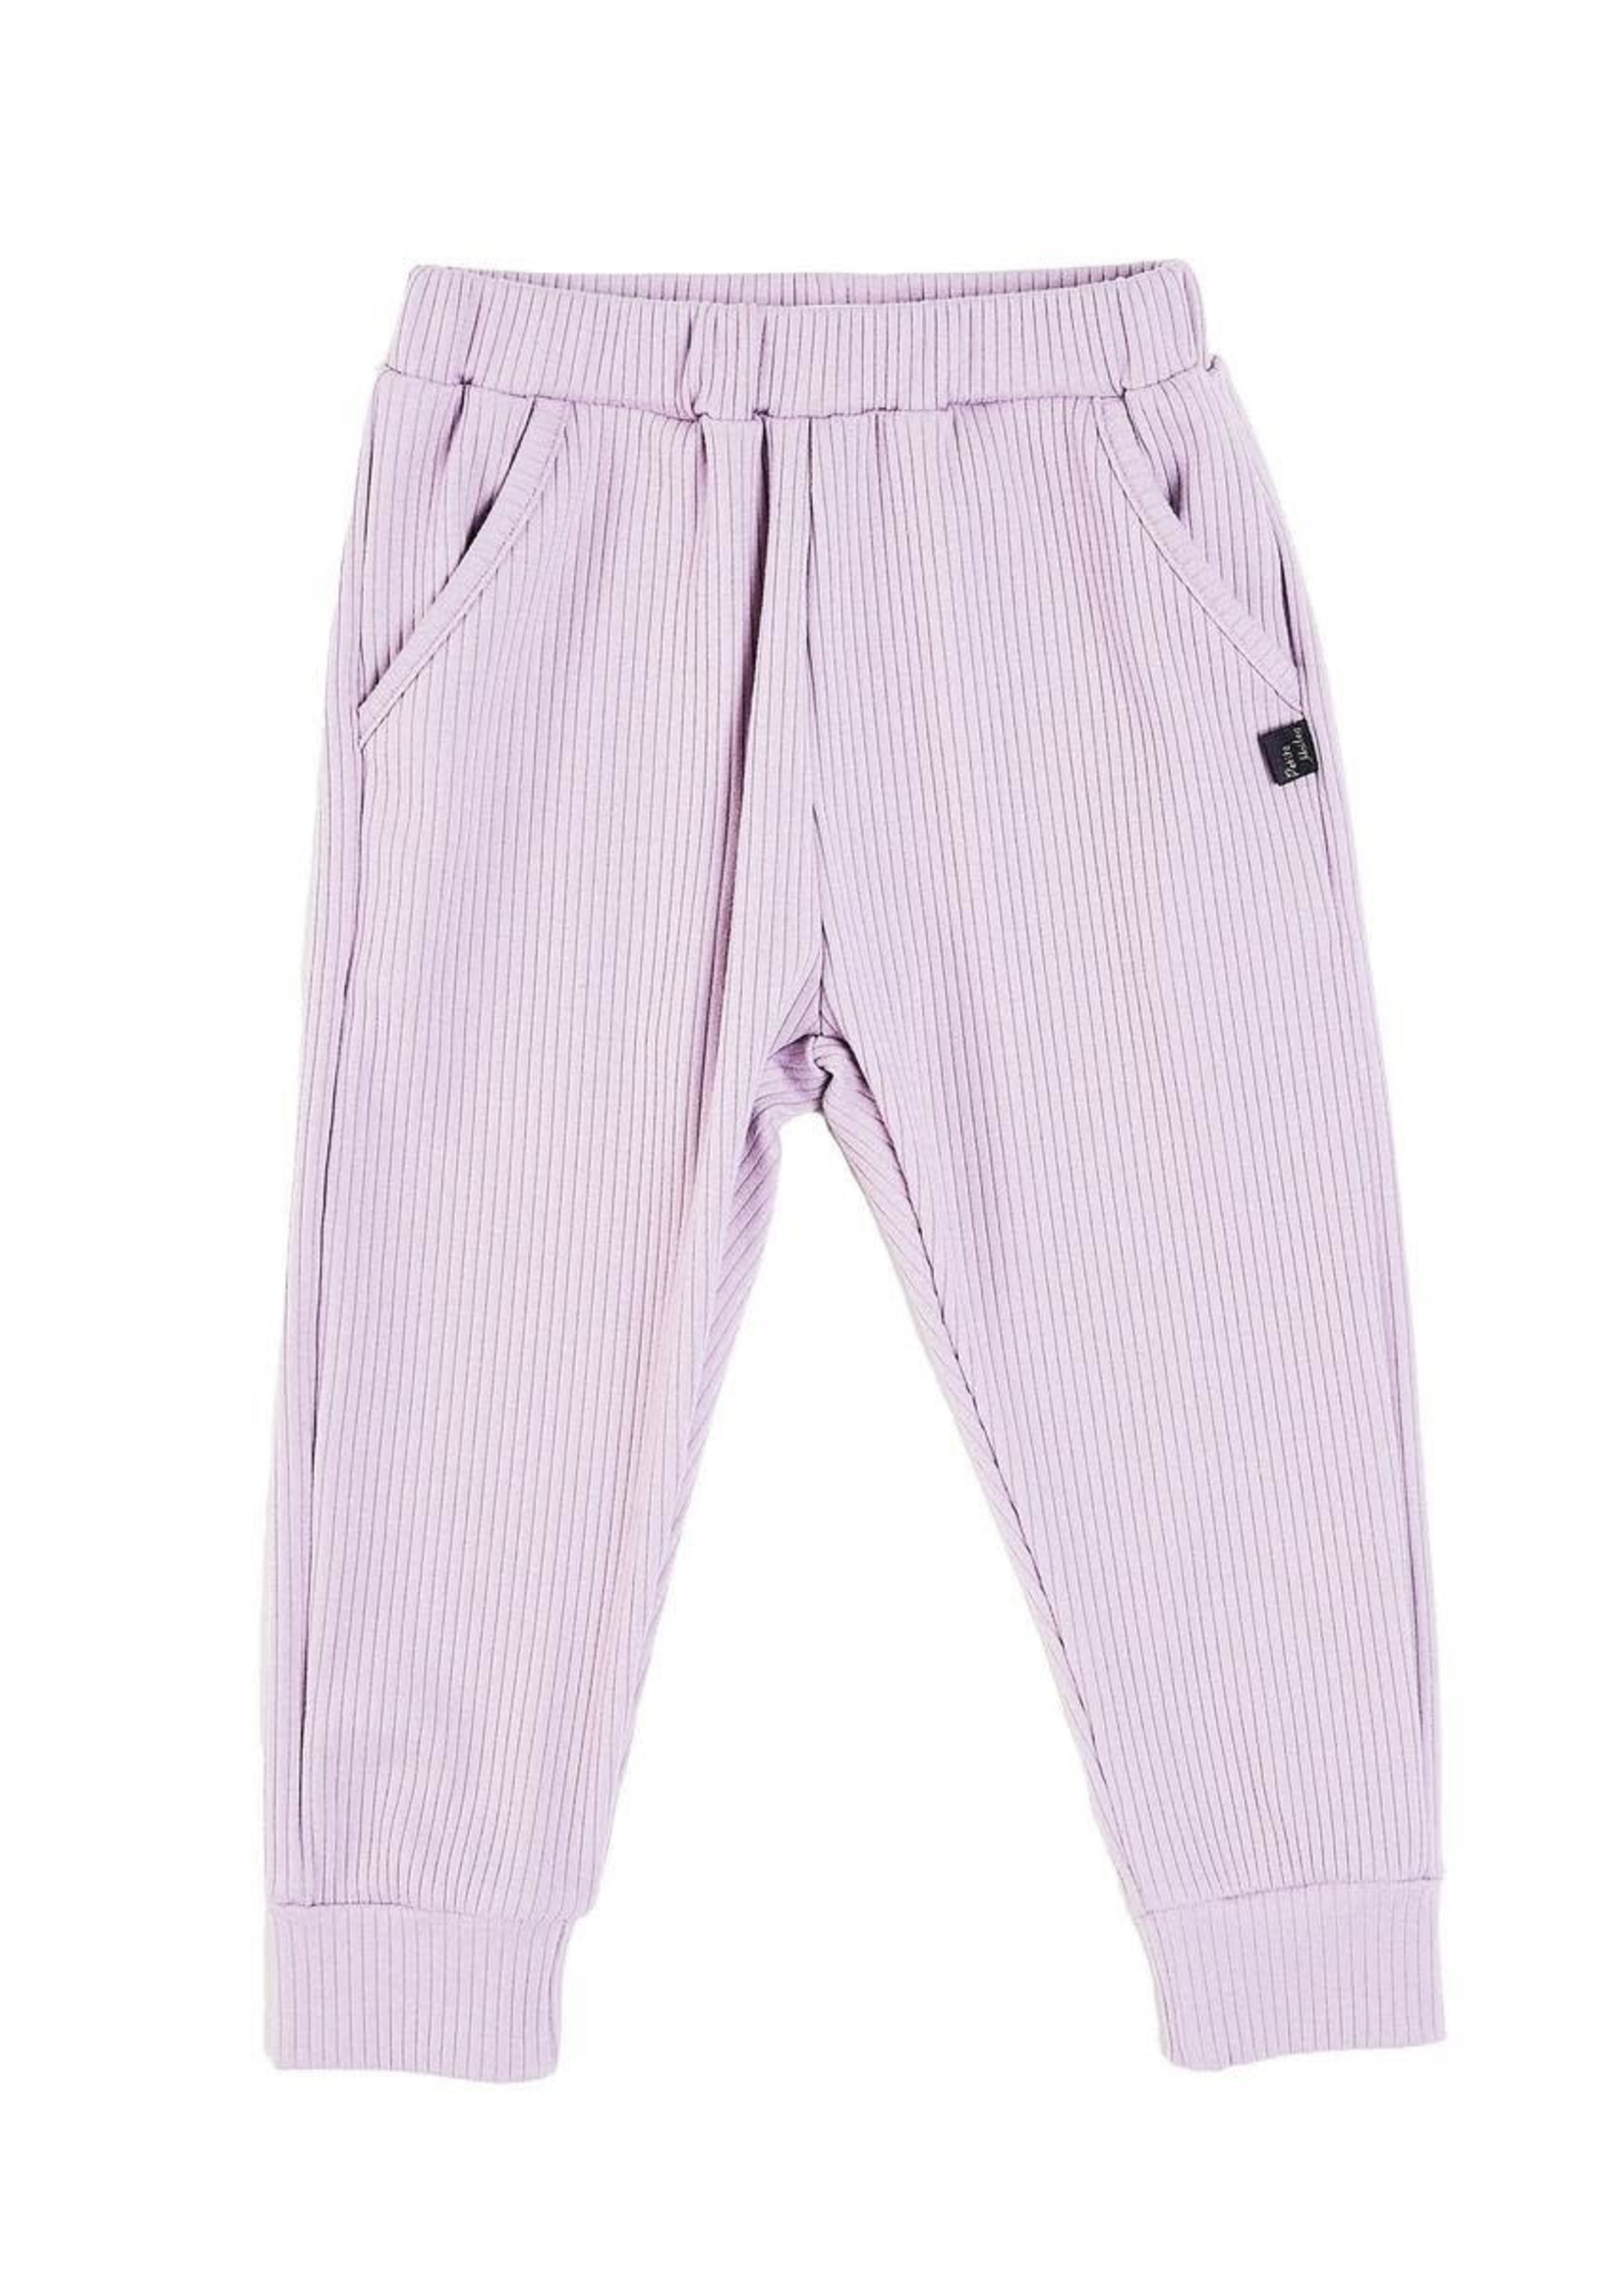 Petite Hailey PH Jogger (Lavender)